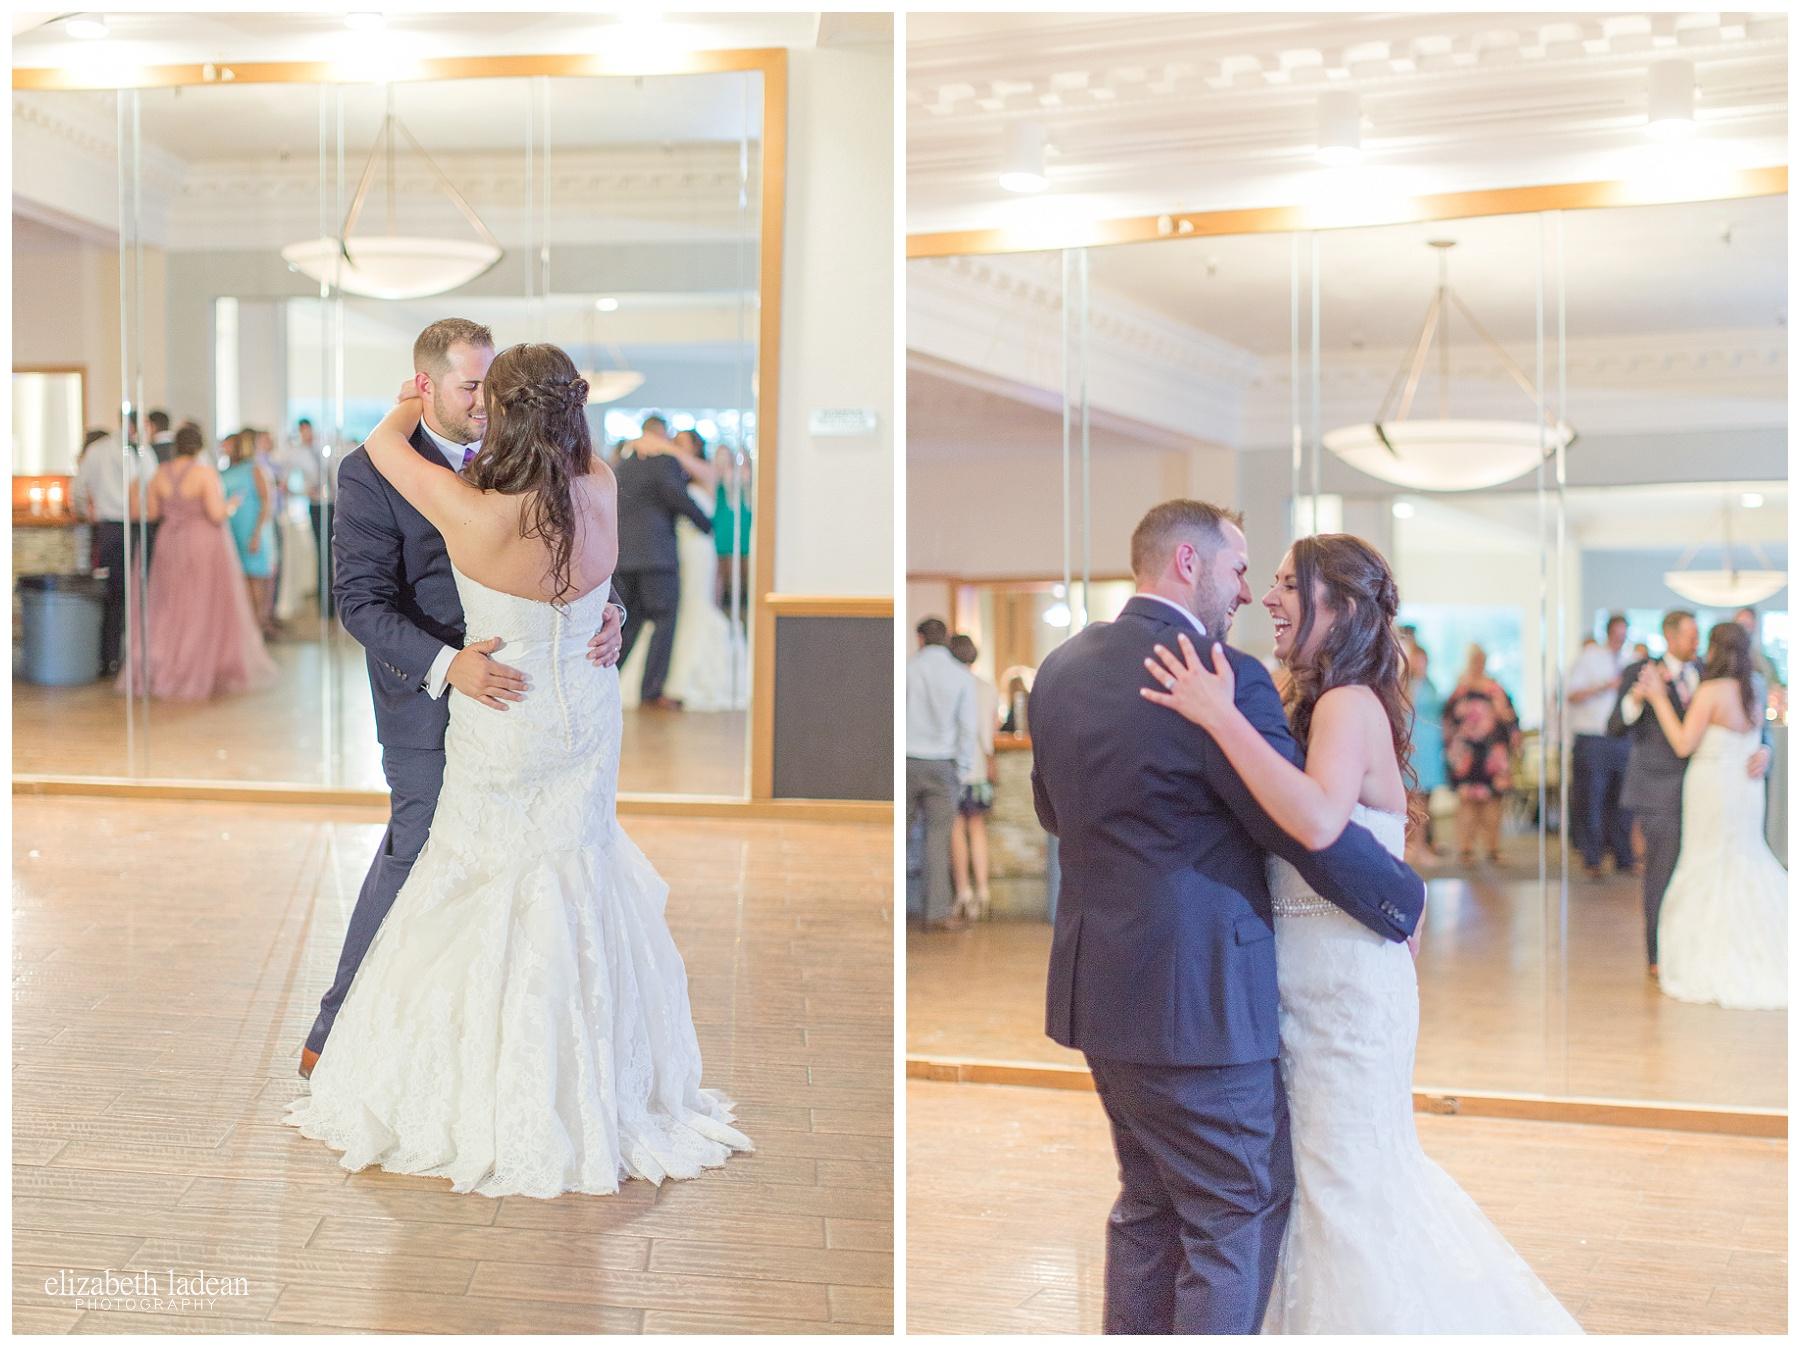 Hillcrest-Country-Club-Kansas-City-Wedding-Photography-E+J-0520-Elizabeth-Ladean-Photography-photo_0882.jpg